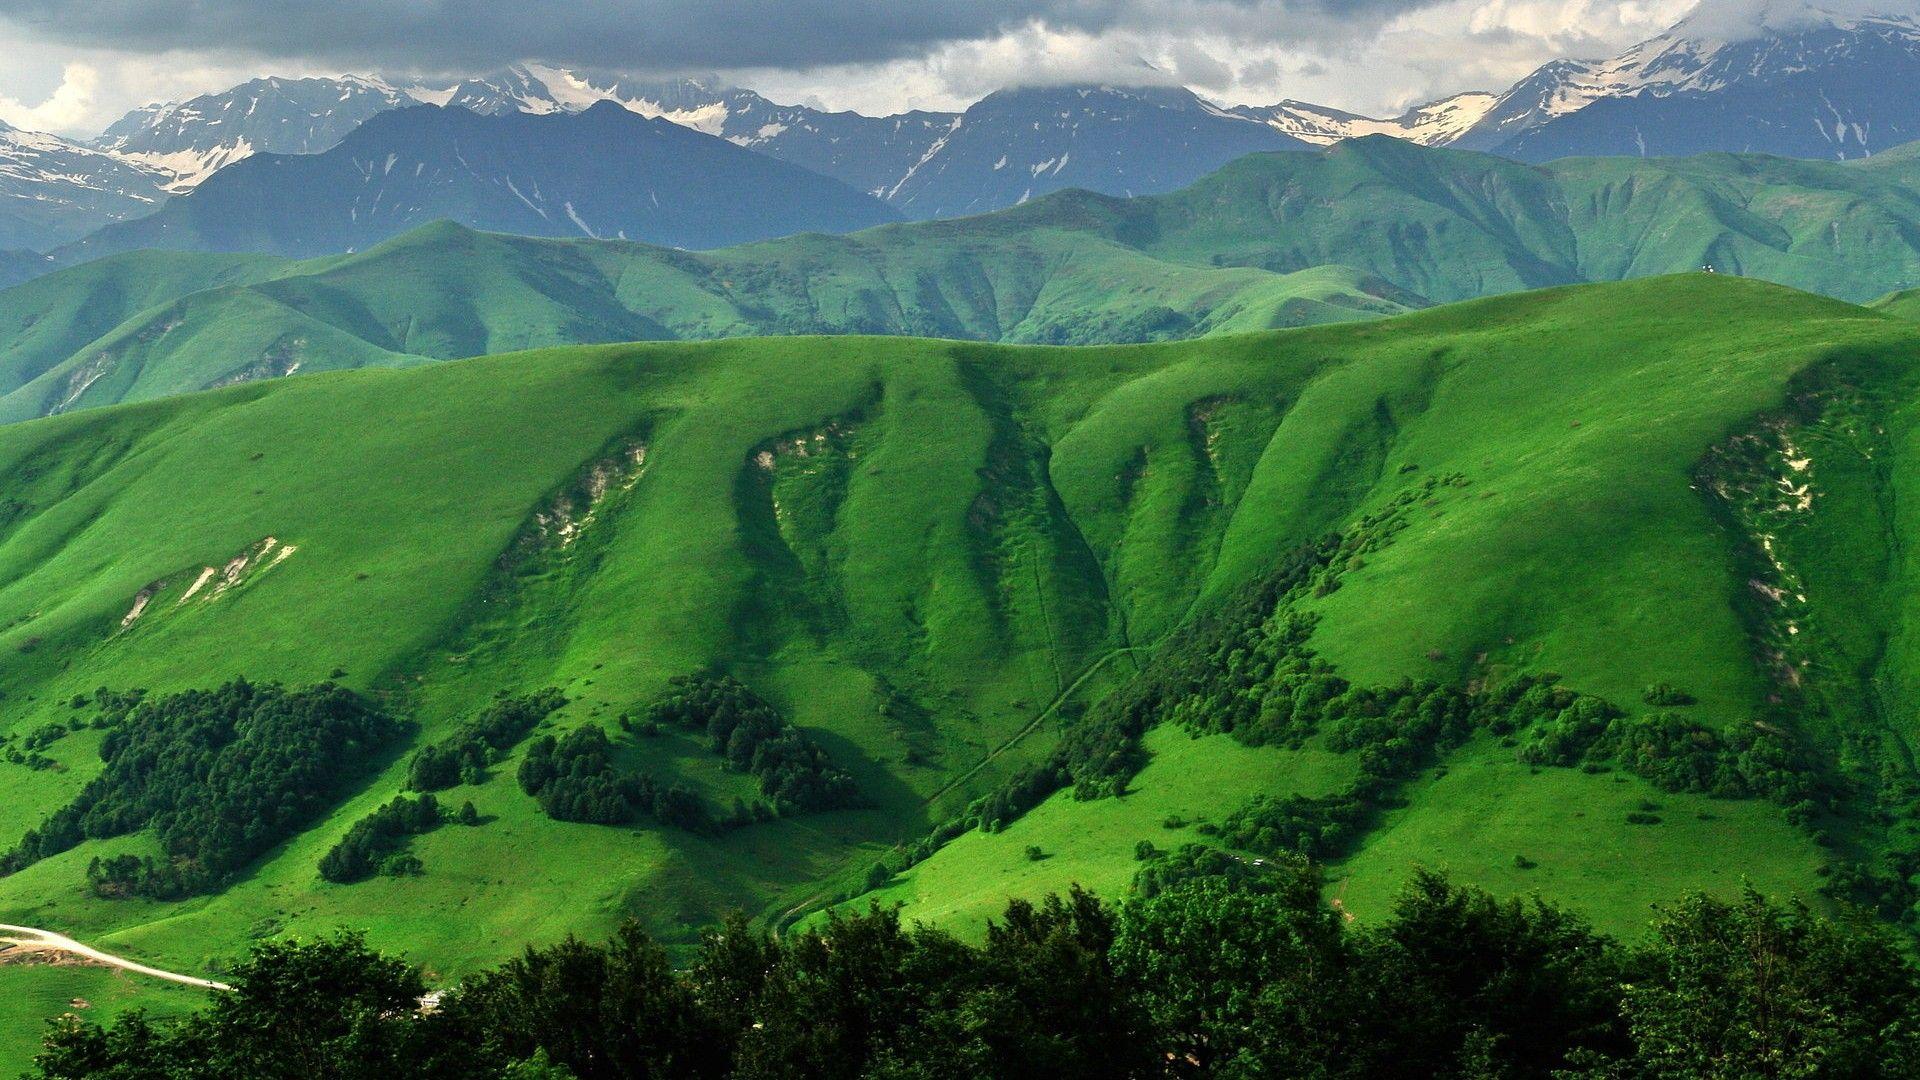 Most Inspiring Wallpaper Mountain Green - 08f402854b6a9741c360729da3b58736  Image_88269.jpg